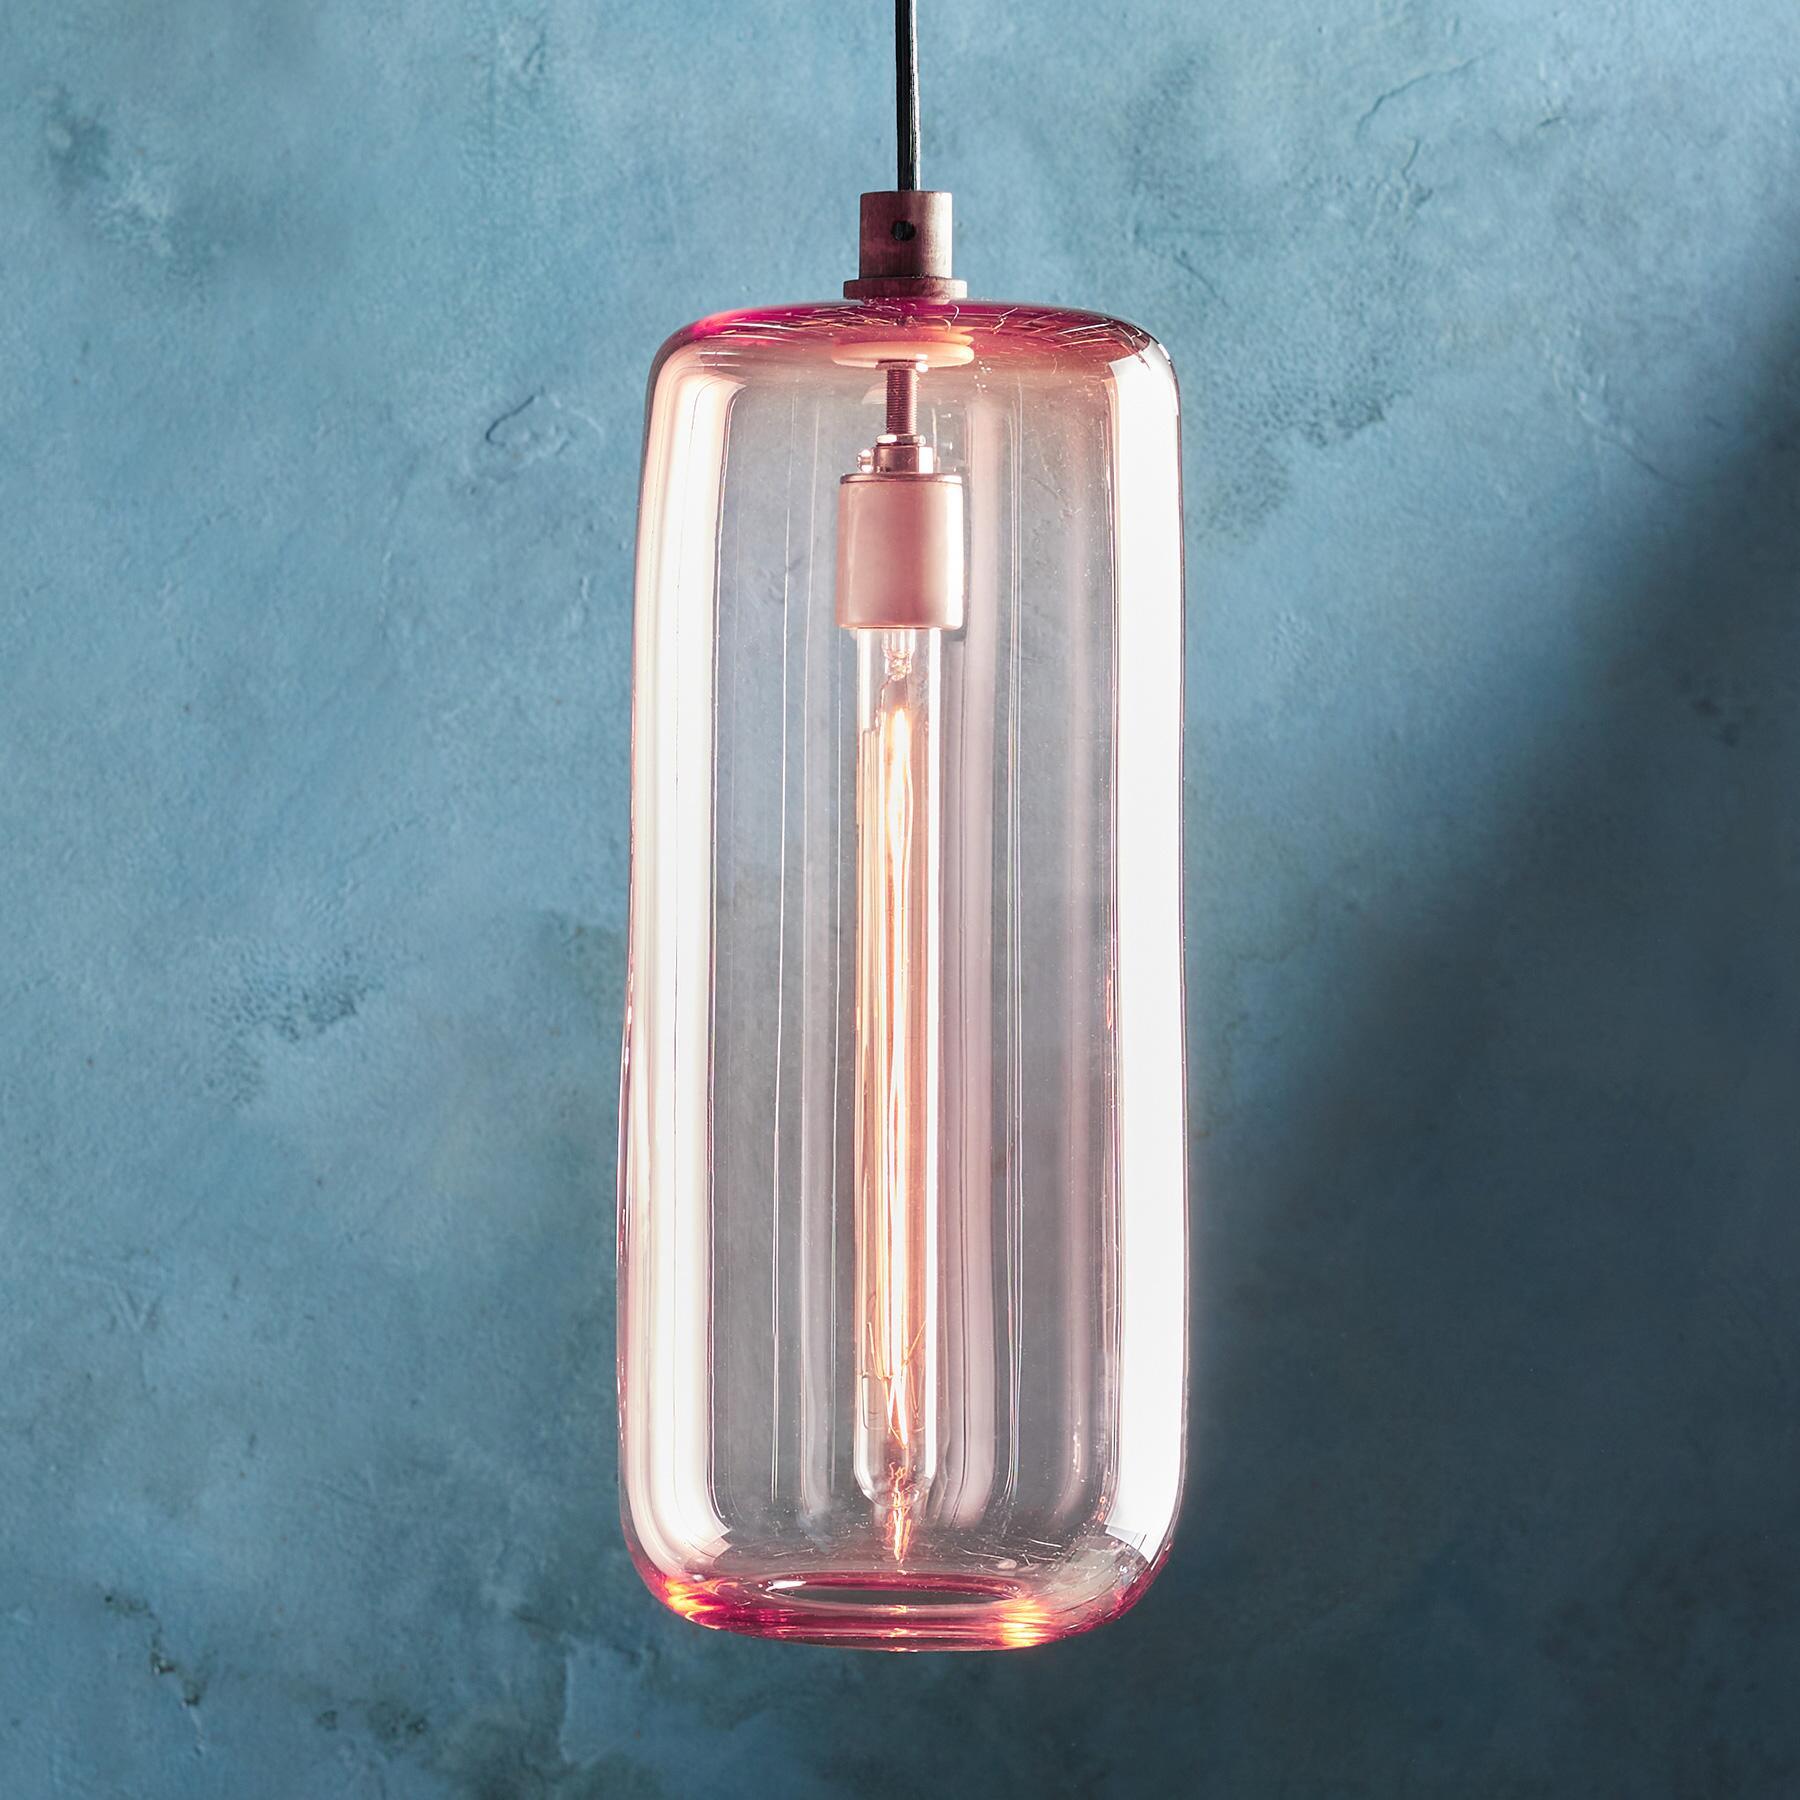 SALON GLASS CYLINDER PENDANT LIGHT: View 1